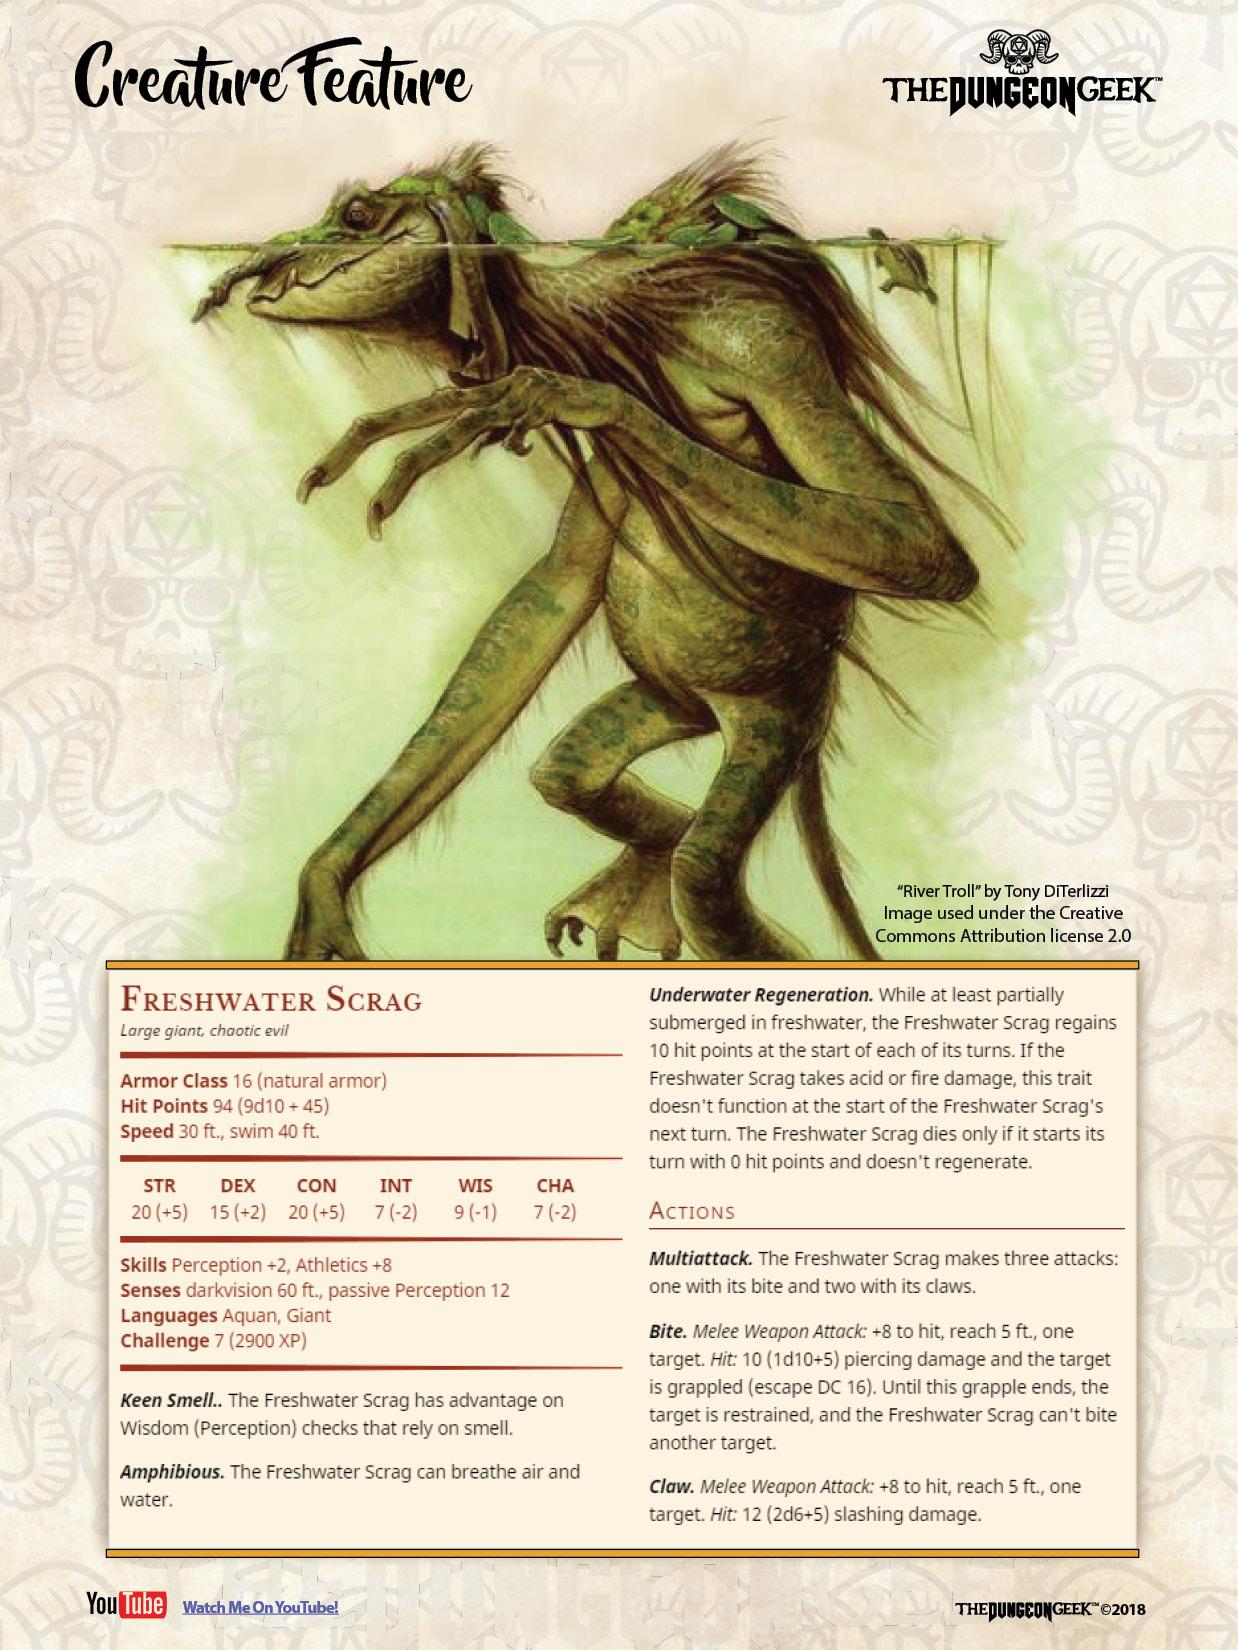 Dd Creature Feature Freshwater Scrag The Dungeon Geek